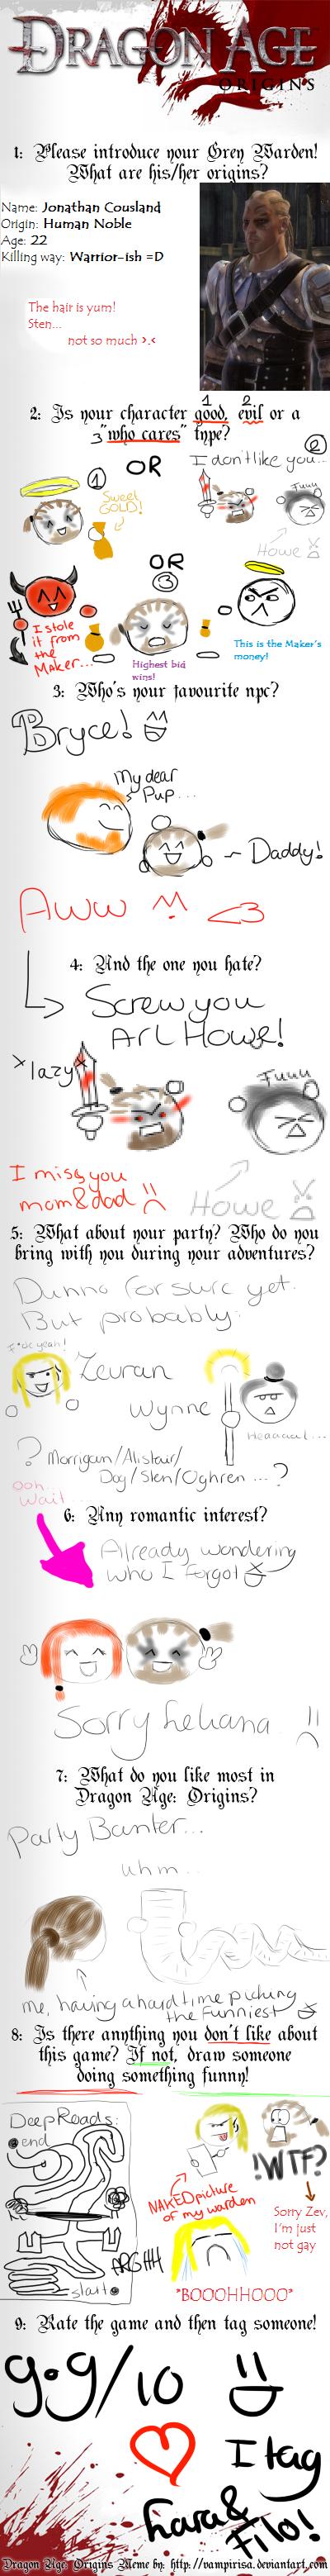 DA:O Meme - Jonathan Cousland by Countess-Nynke